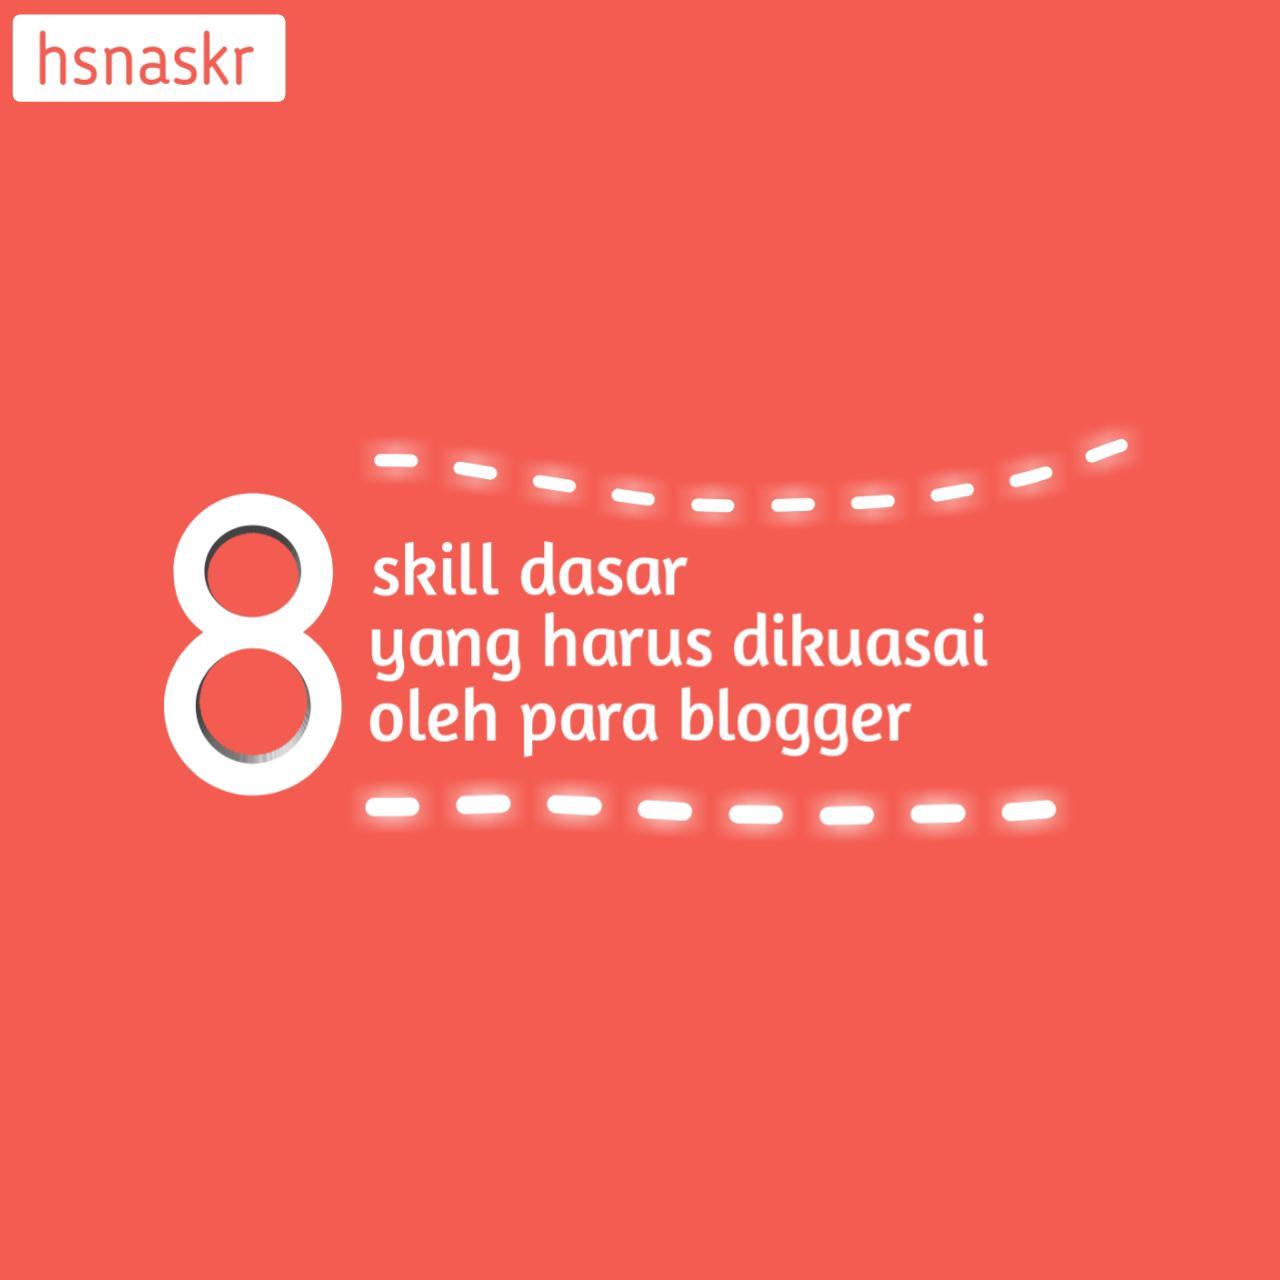 Hasan Askari: 8 skill dasar yang harus dikuasai oleh para blogger